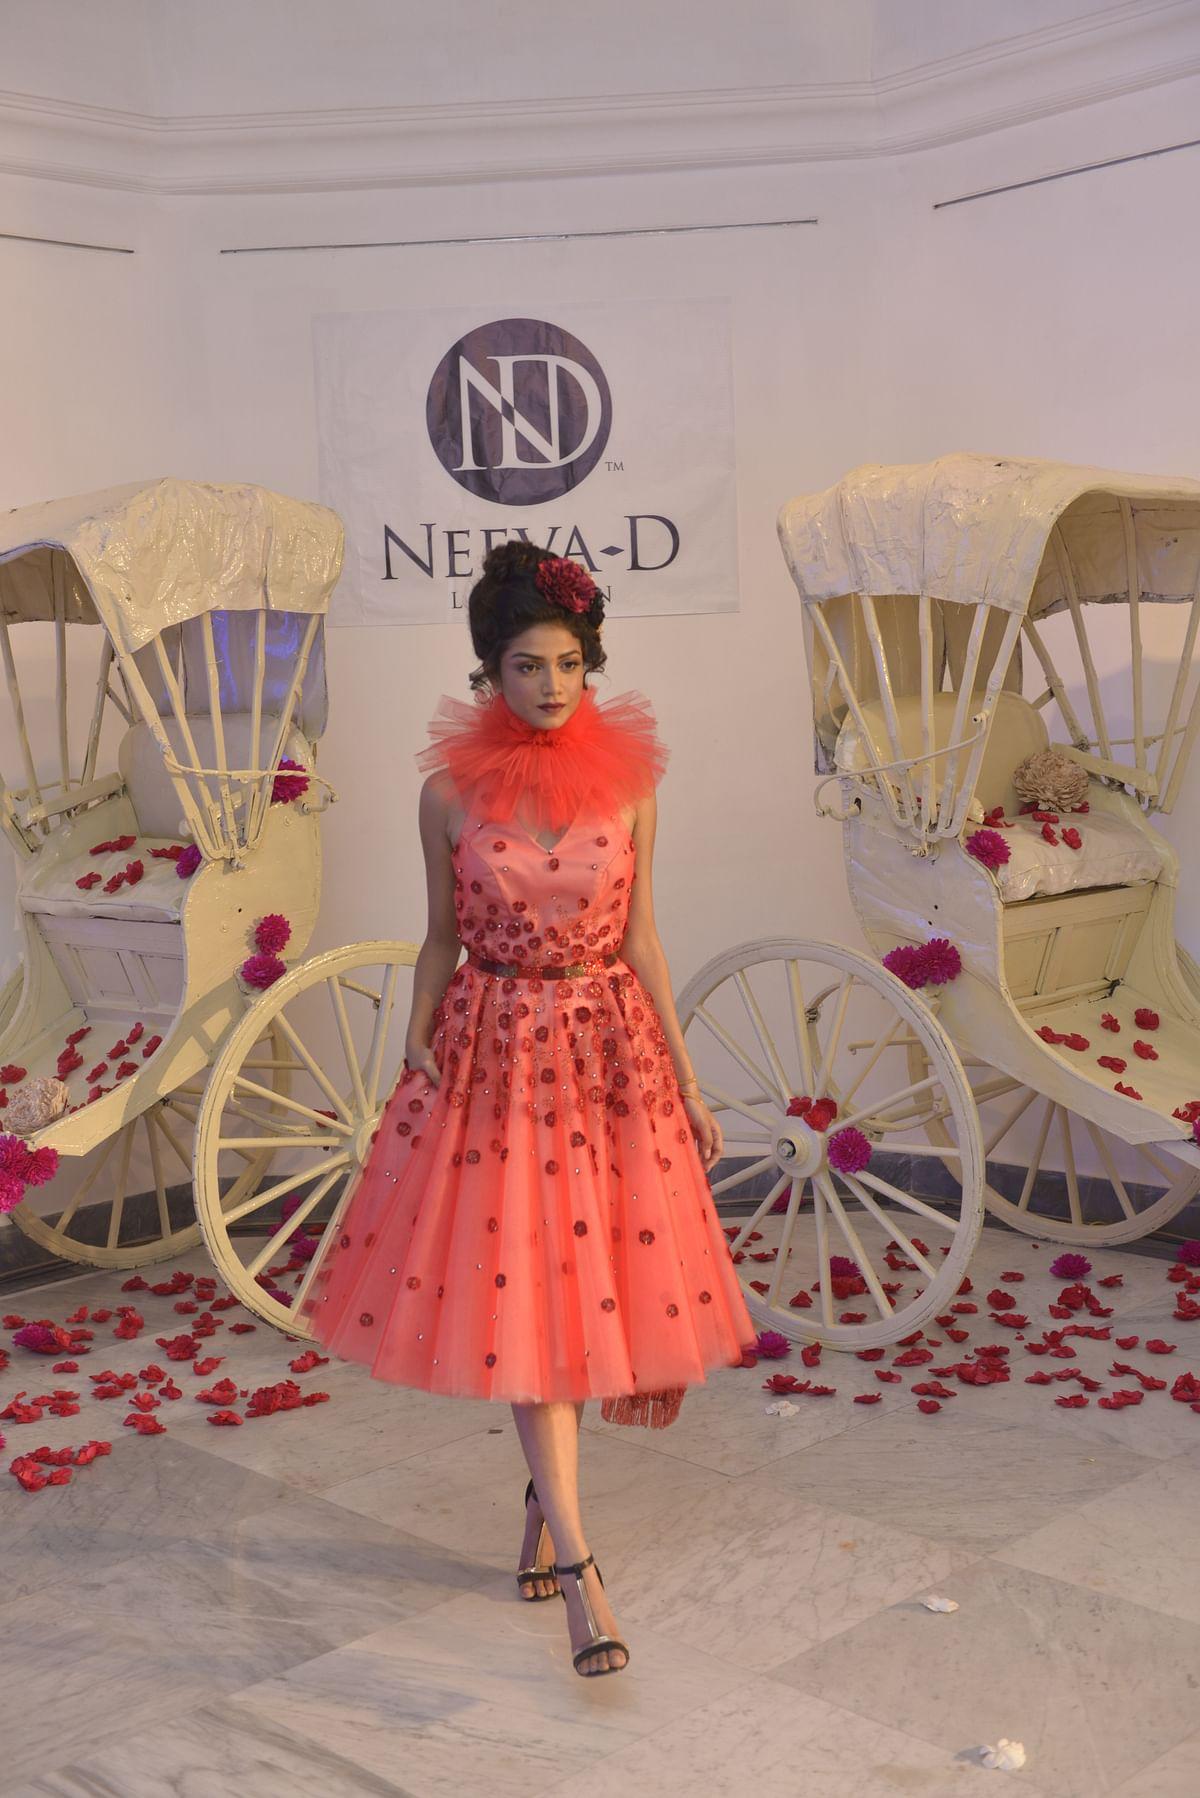 A model walks in a Neeva Debnath dress at the 'Neo-Colonial' show in Kolkata.